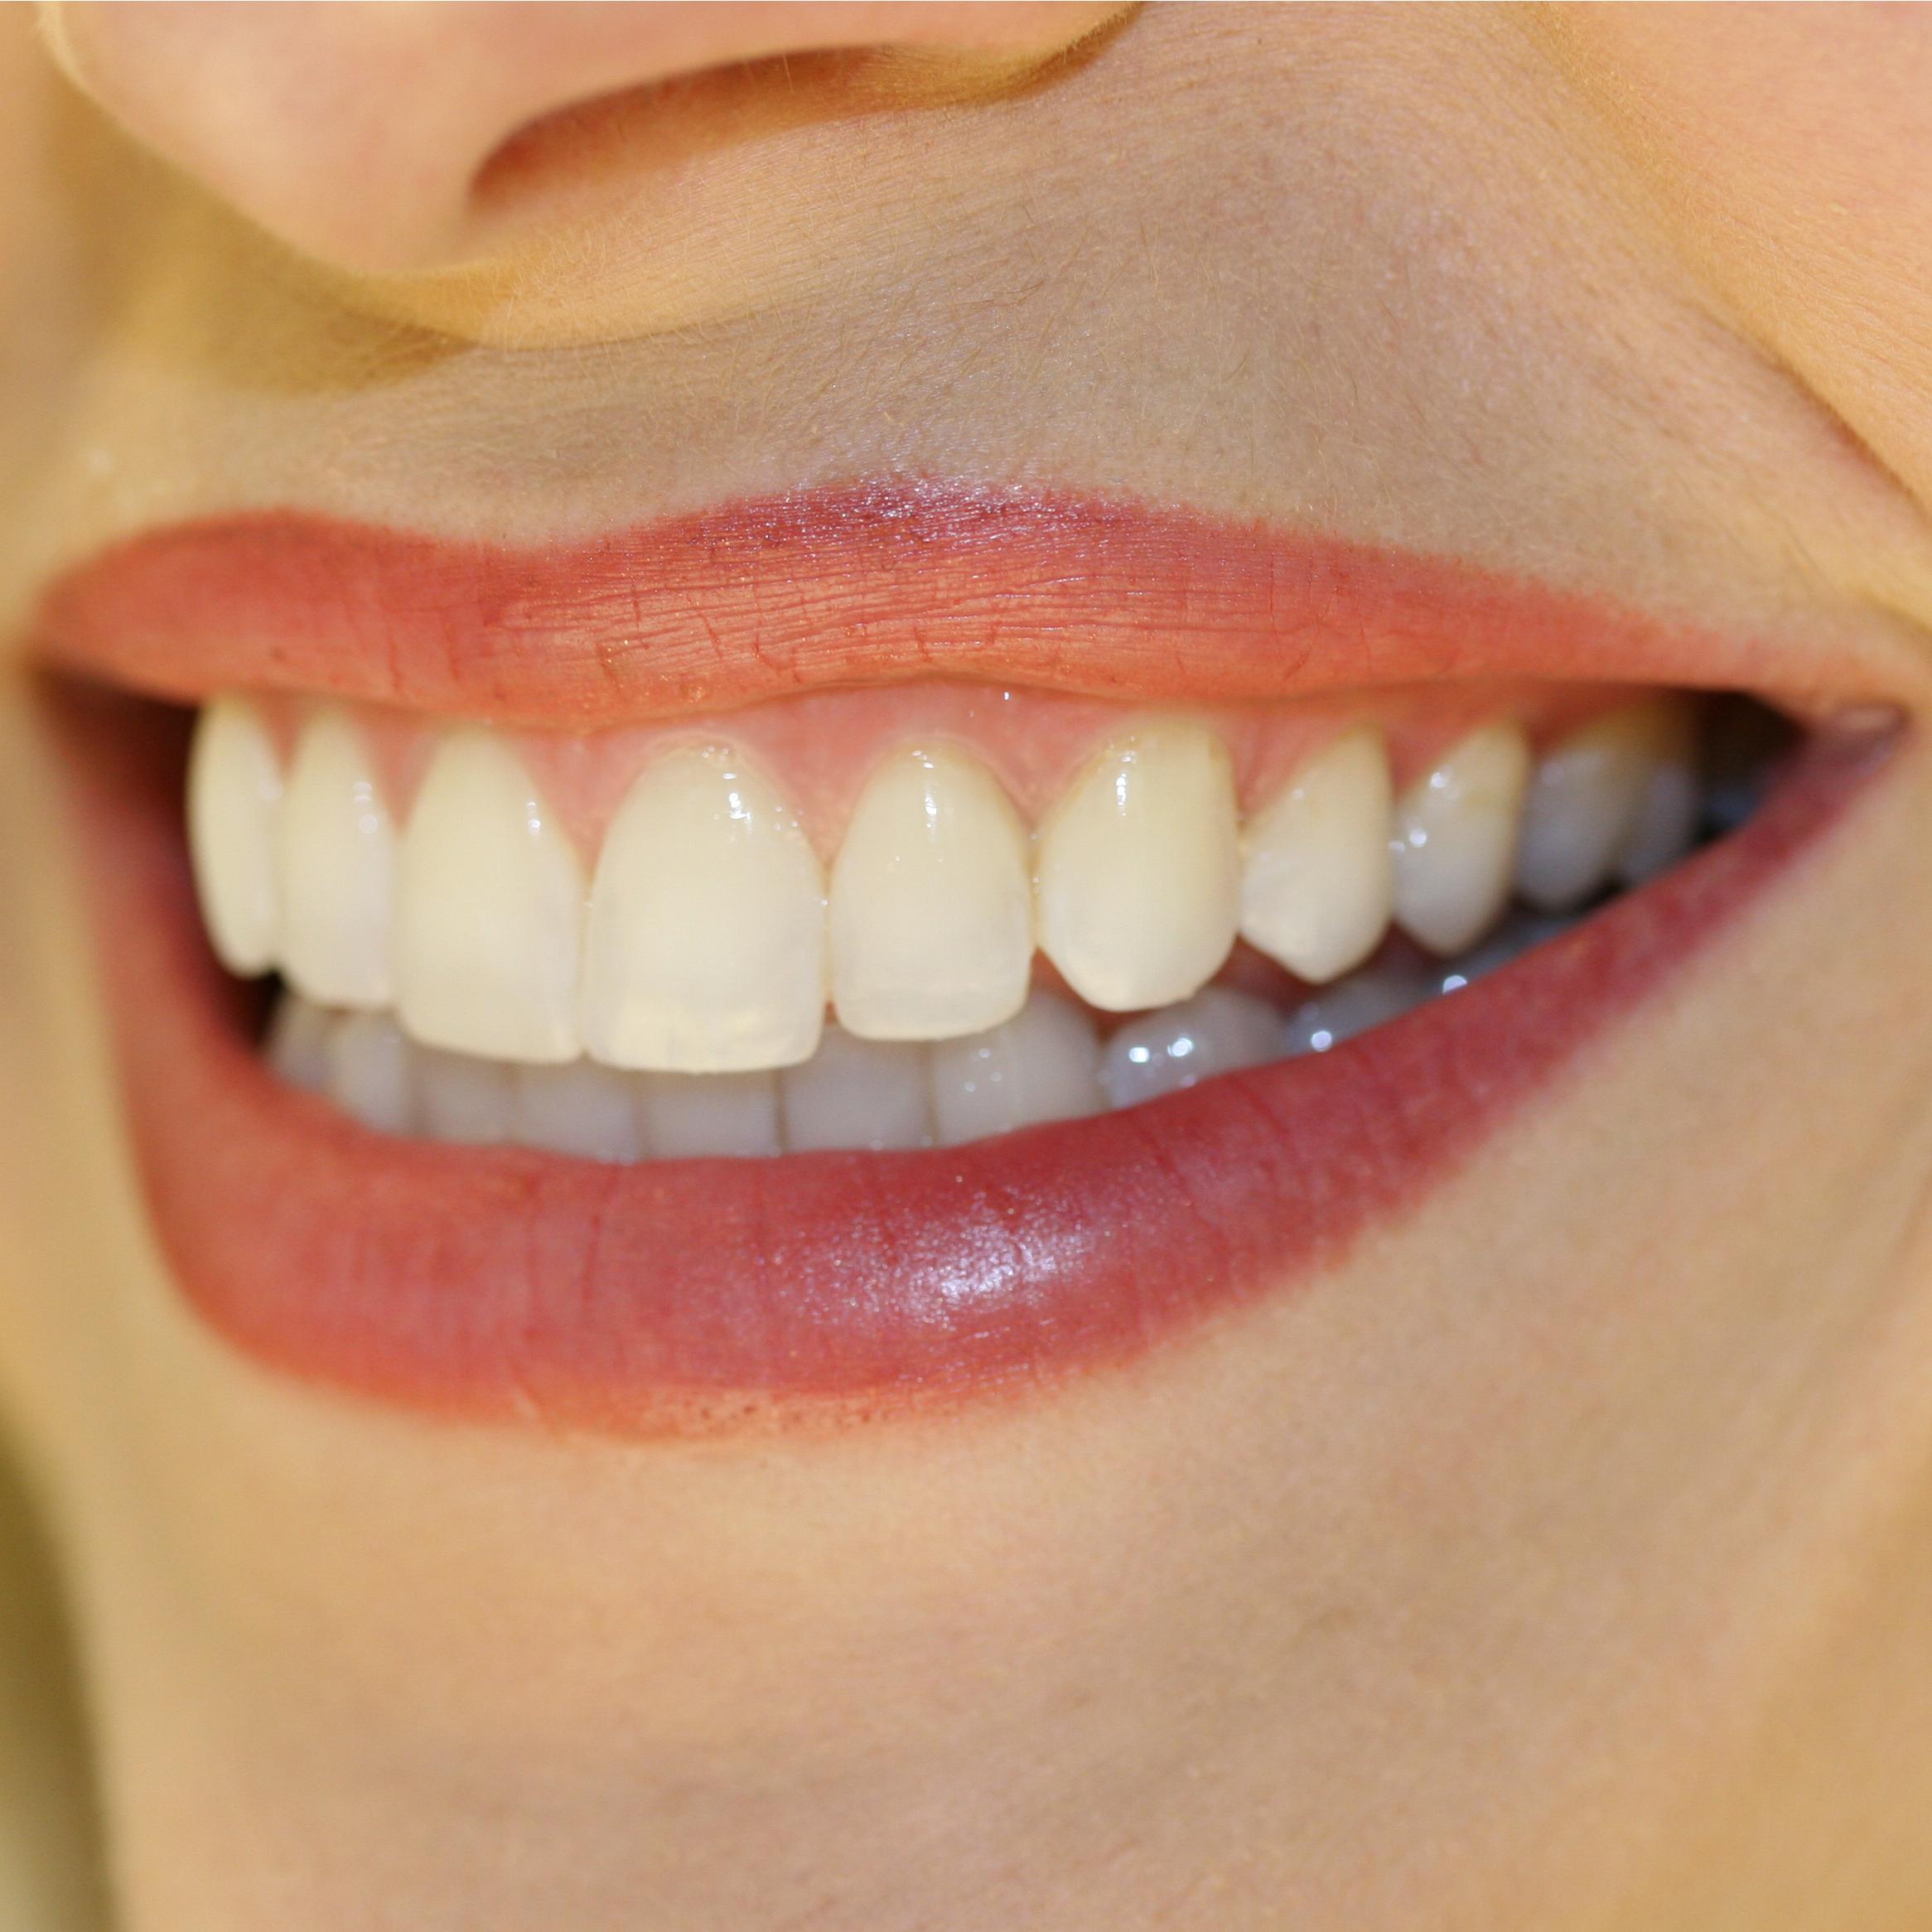 Dentists Smile